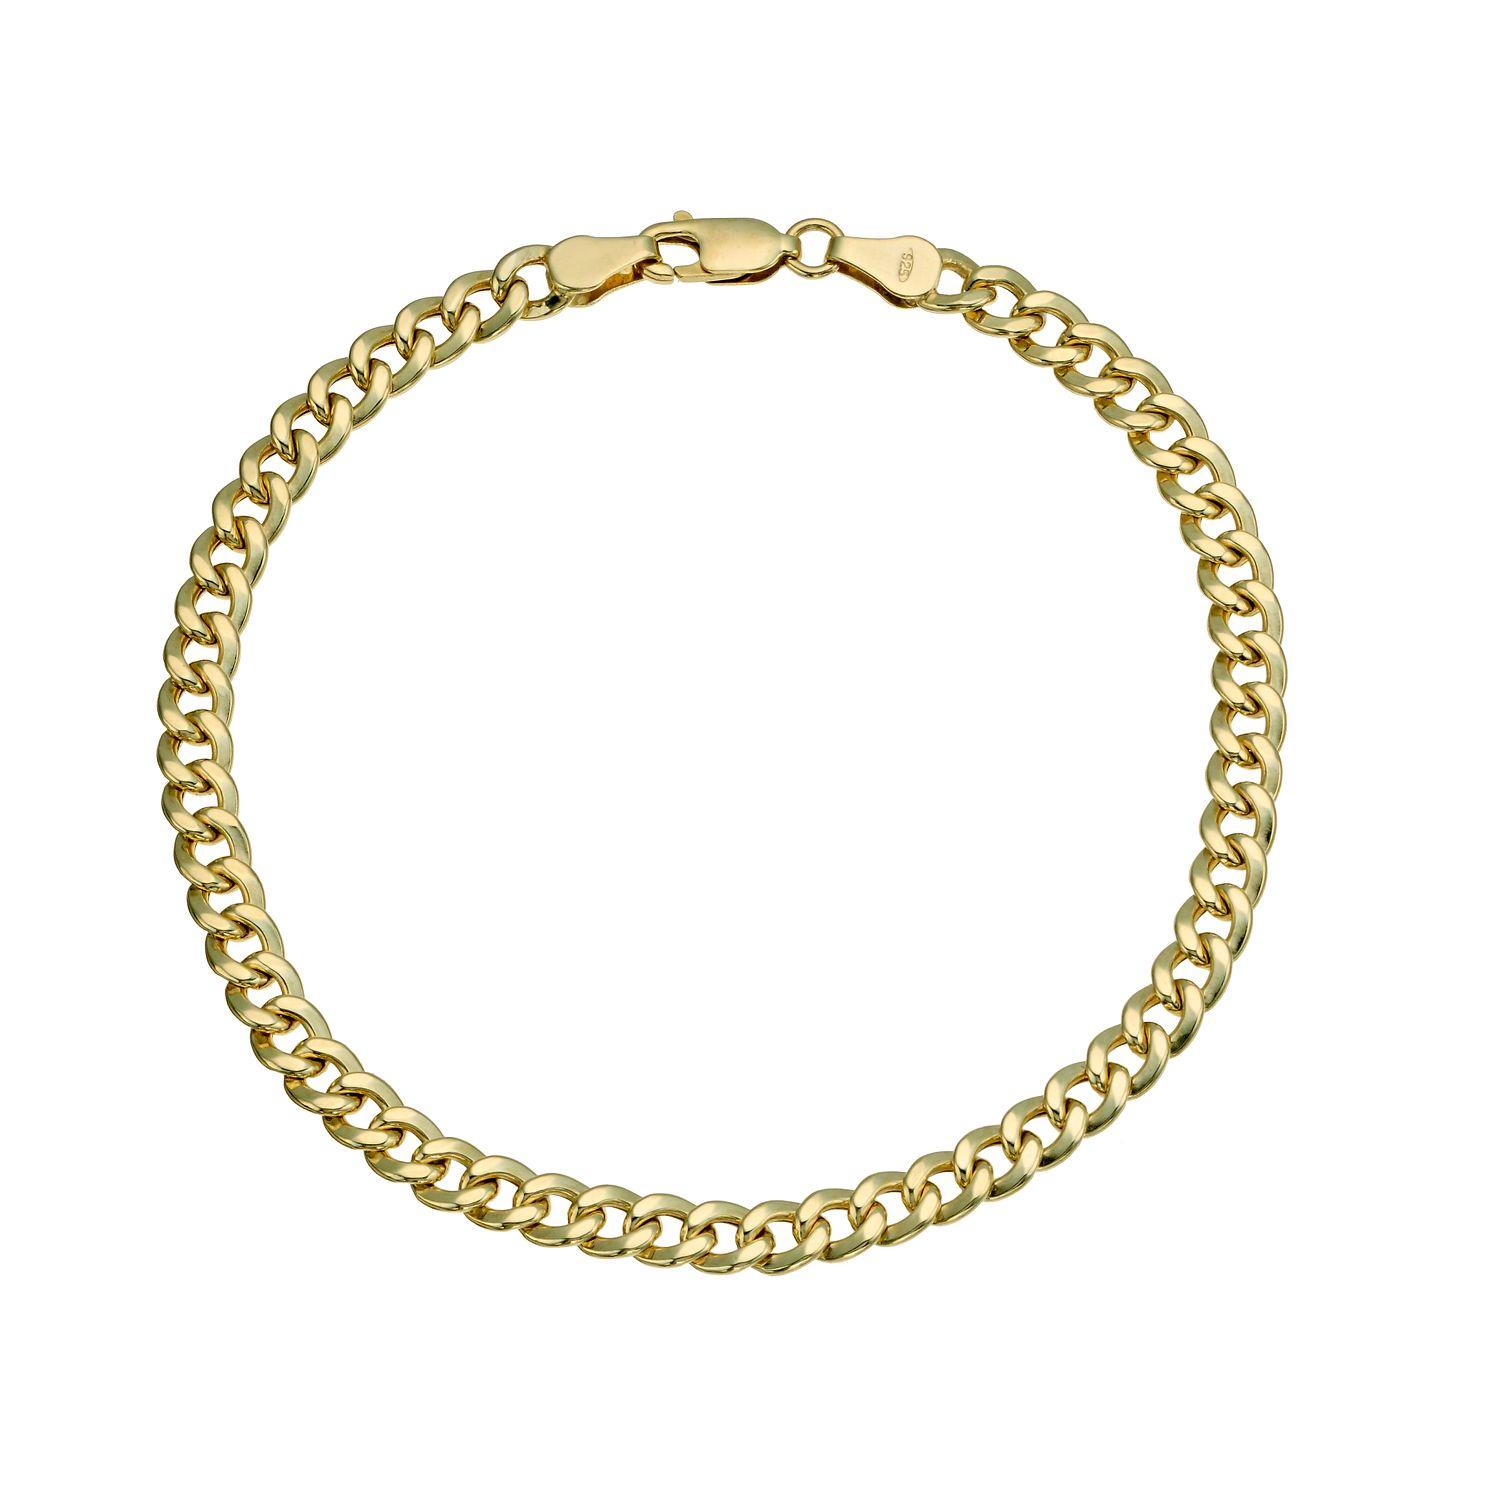 Together Silver 9ct Bonded Gold 8 Inch Curb Chain Bracelet H Samuel